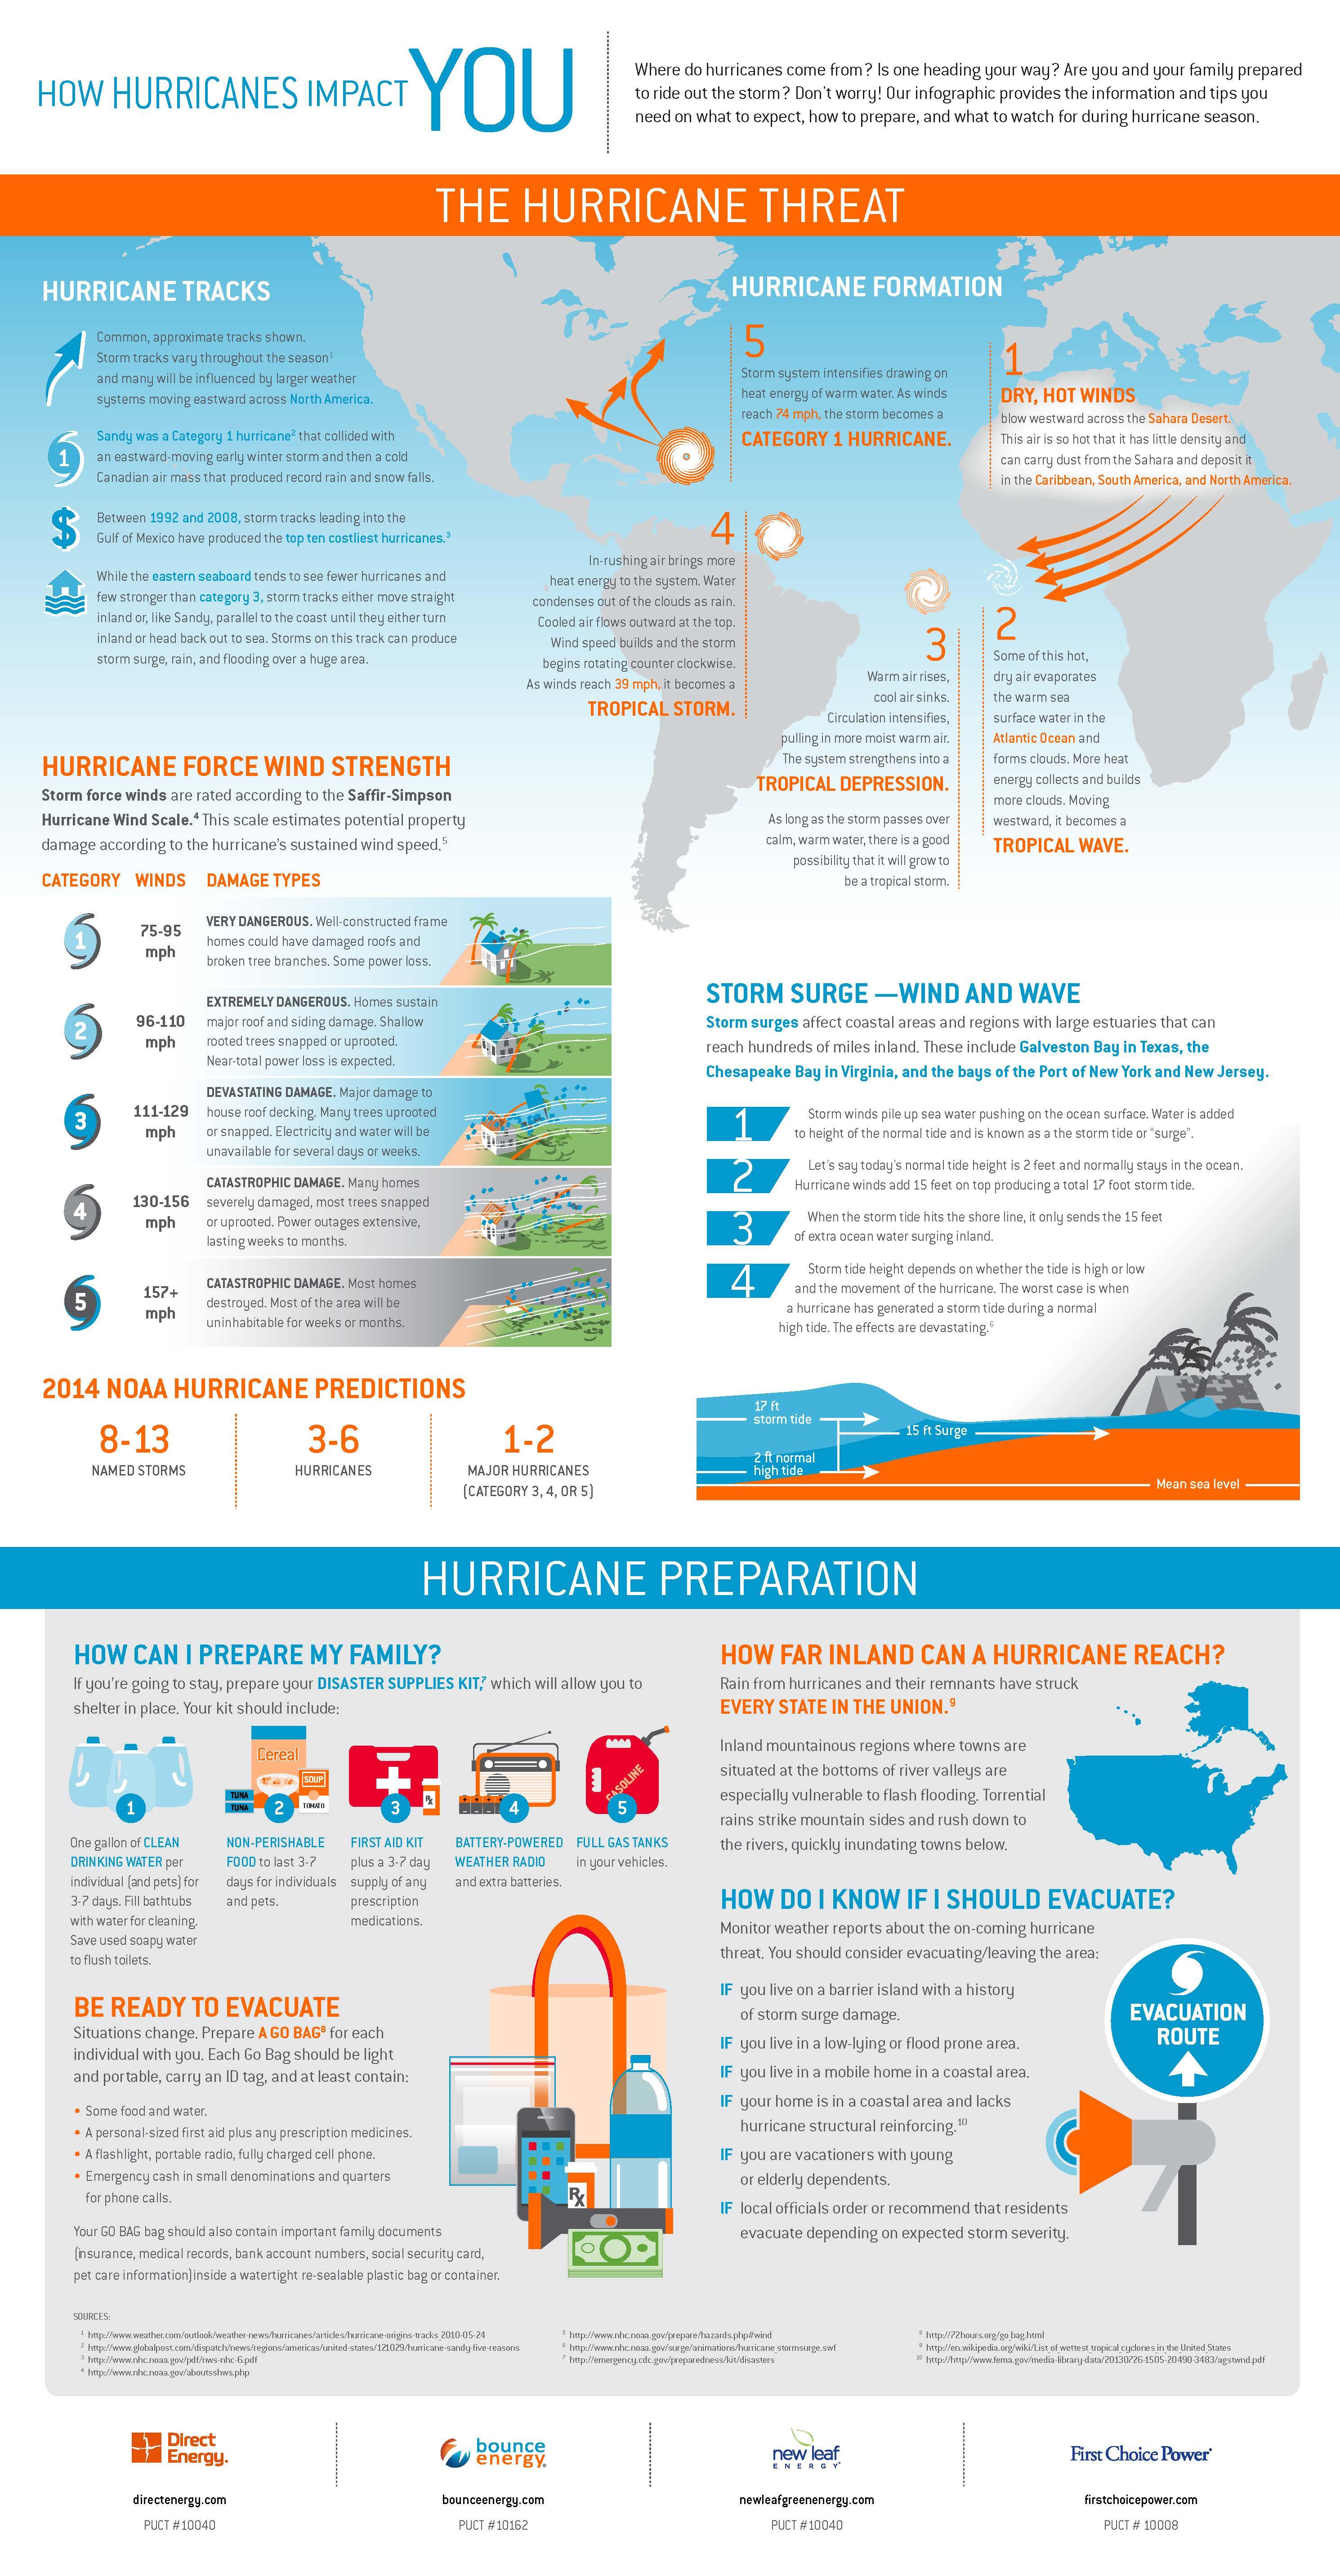 Impact of Hurricanes infographic